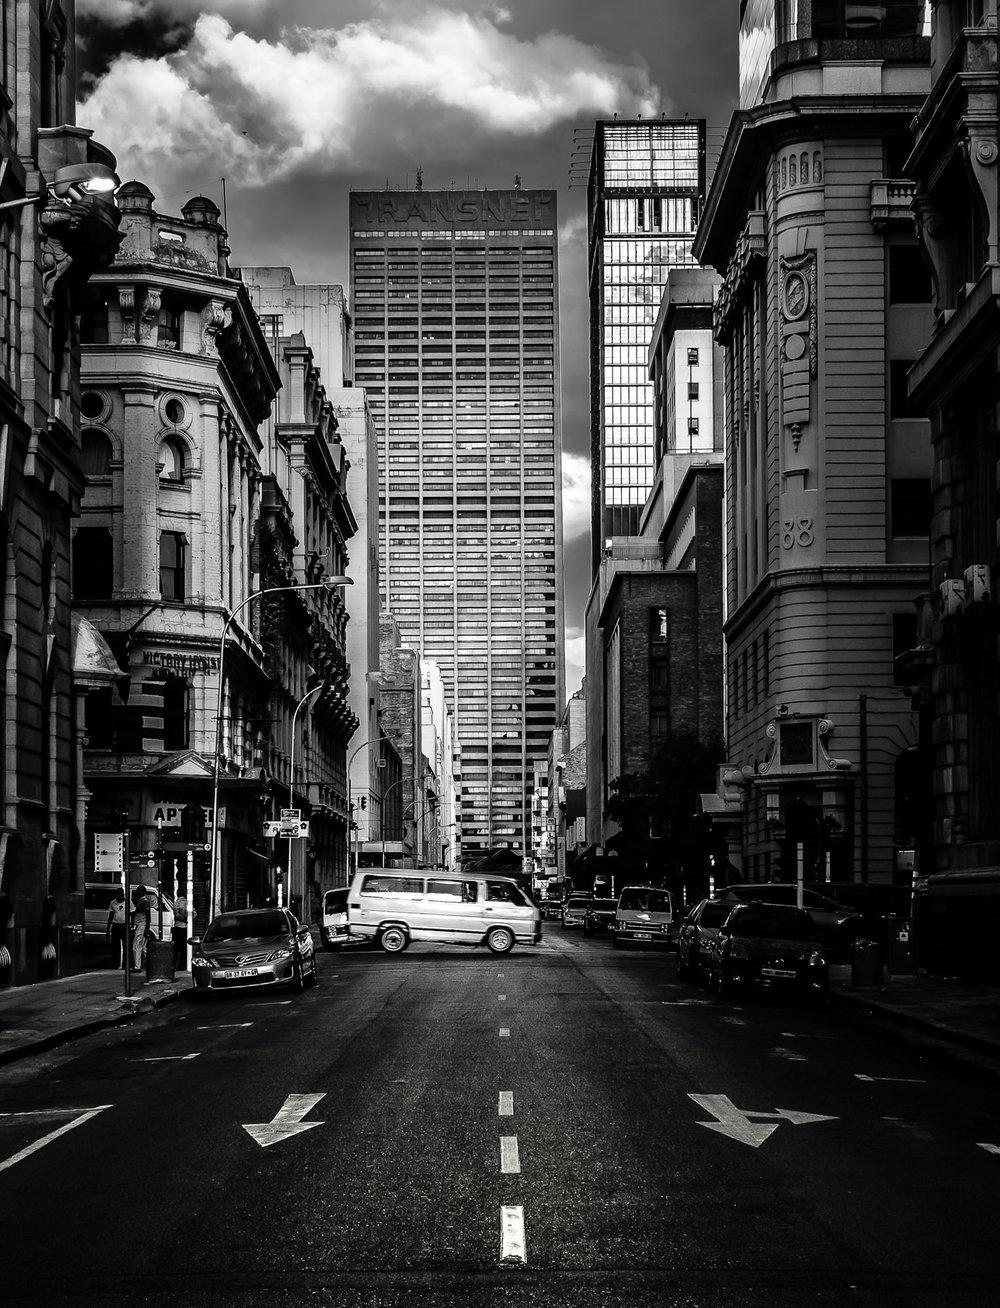 anton-bosman_75_cityscapes_10.jpg